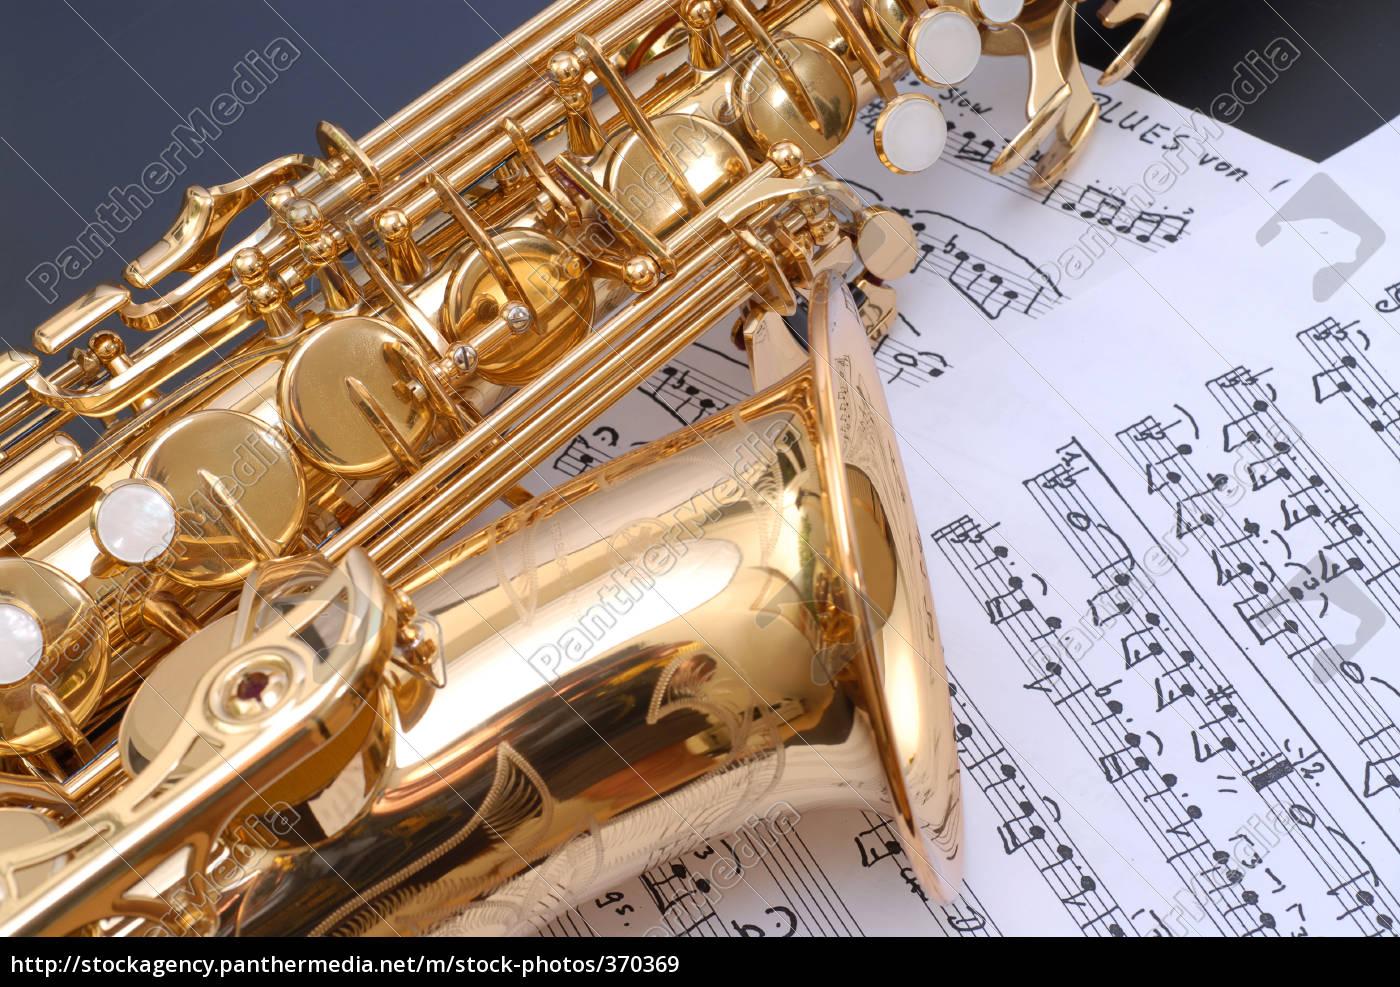 saxophone - 370369